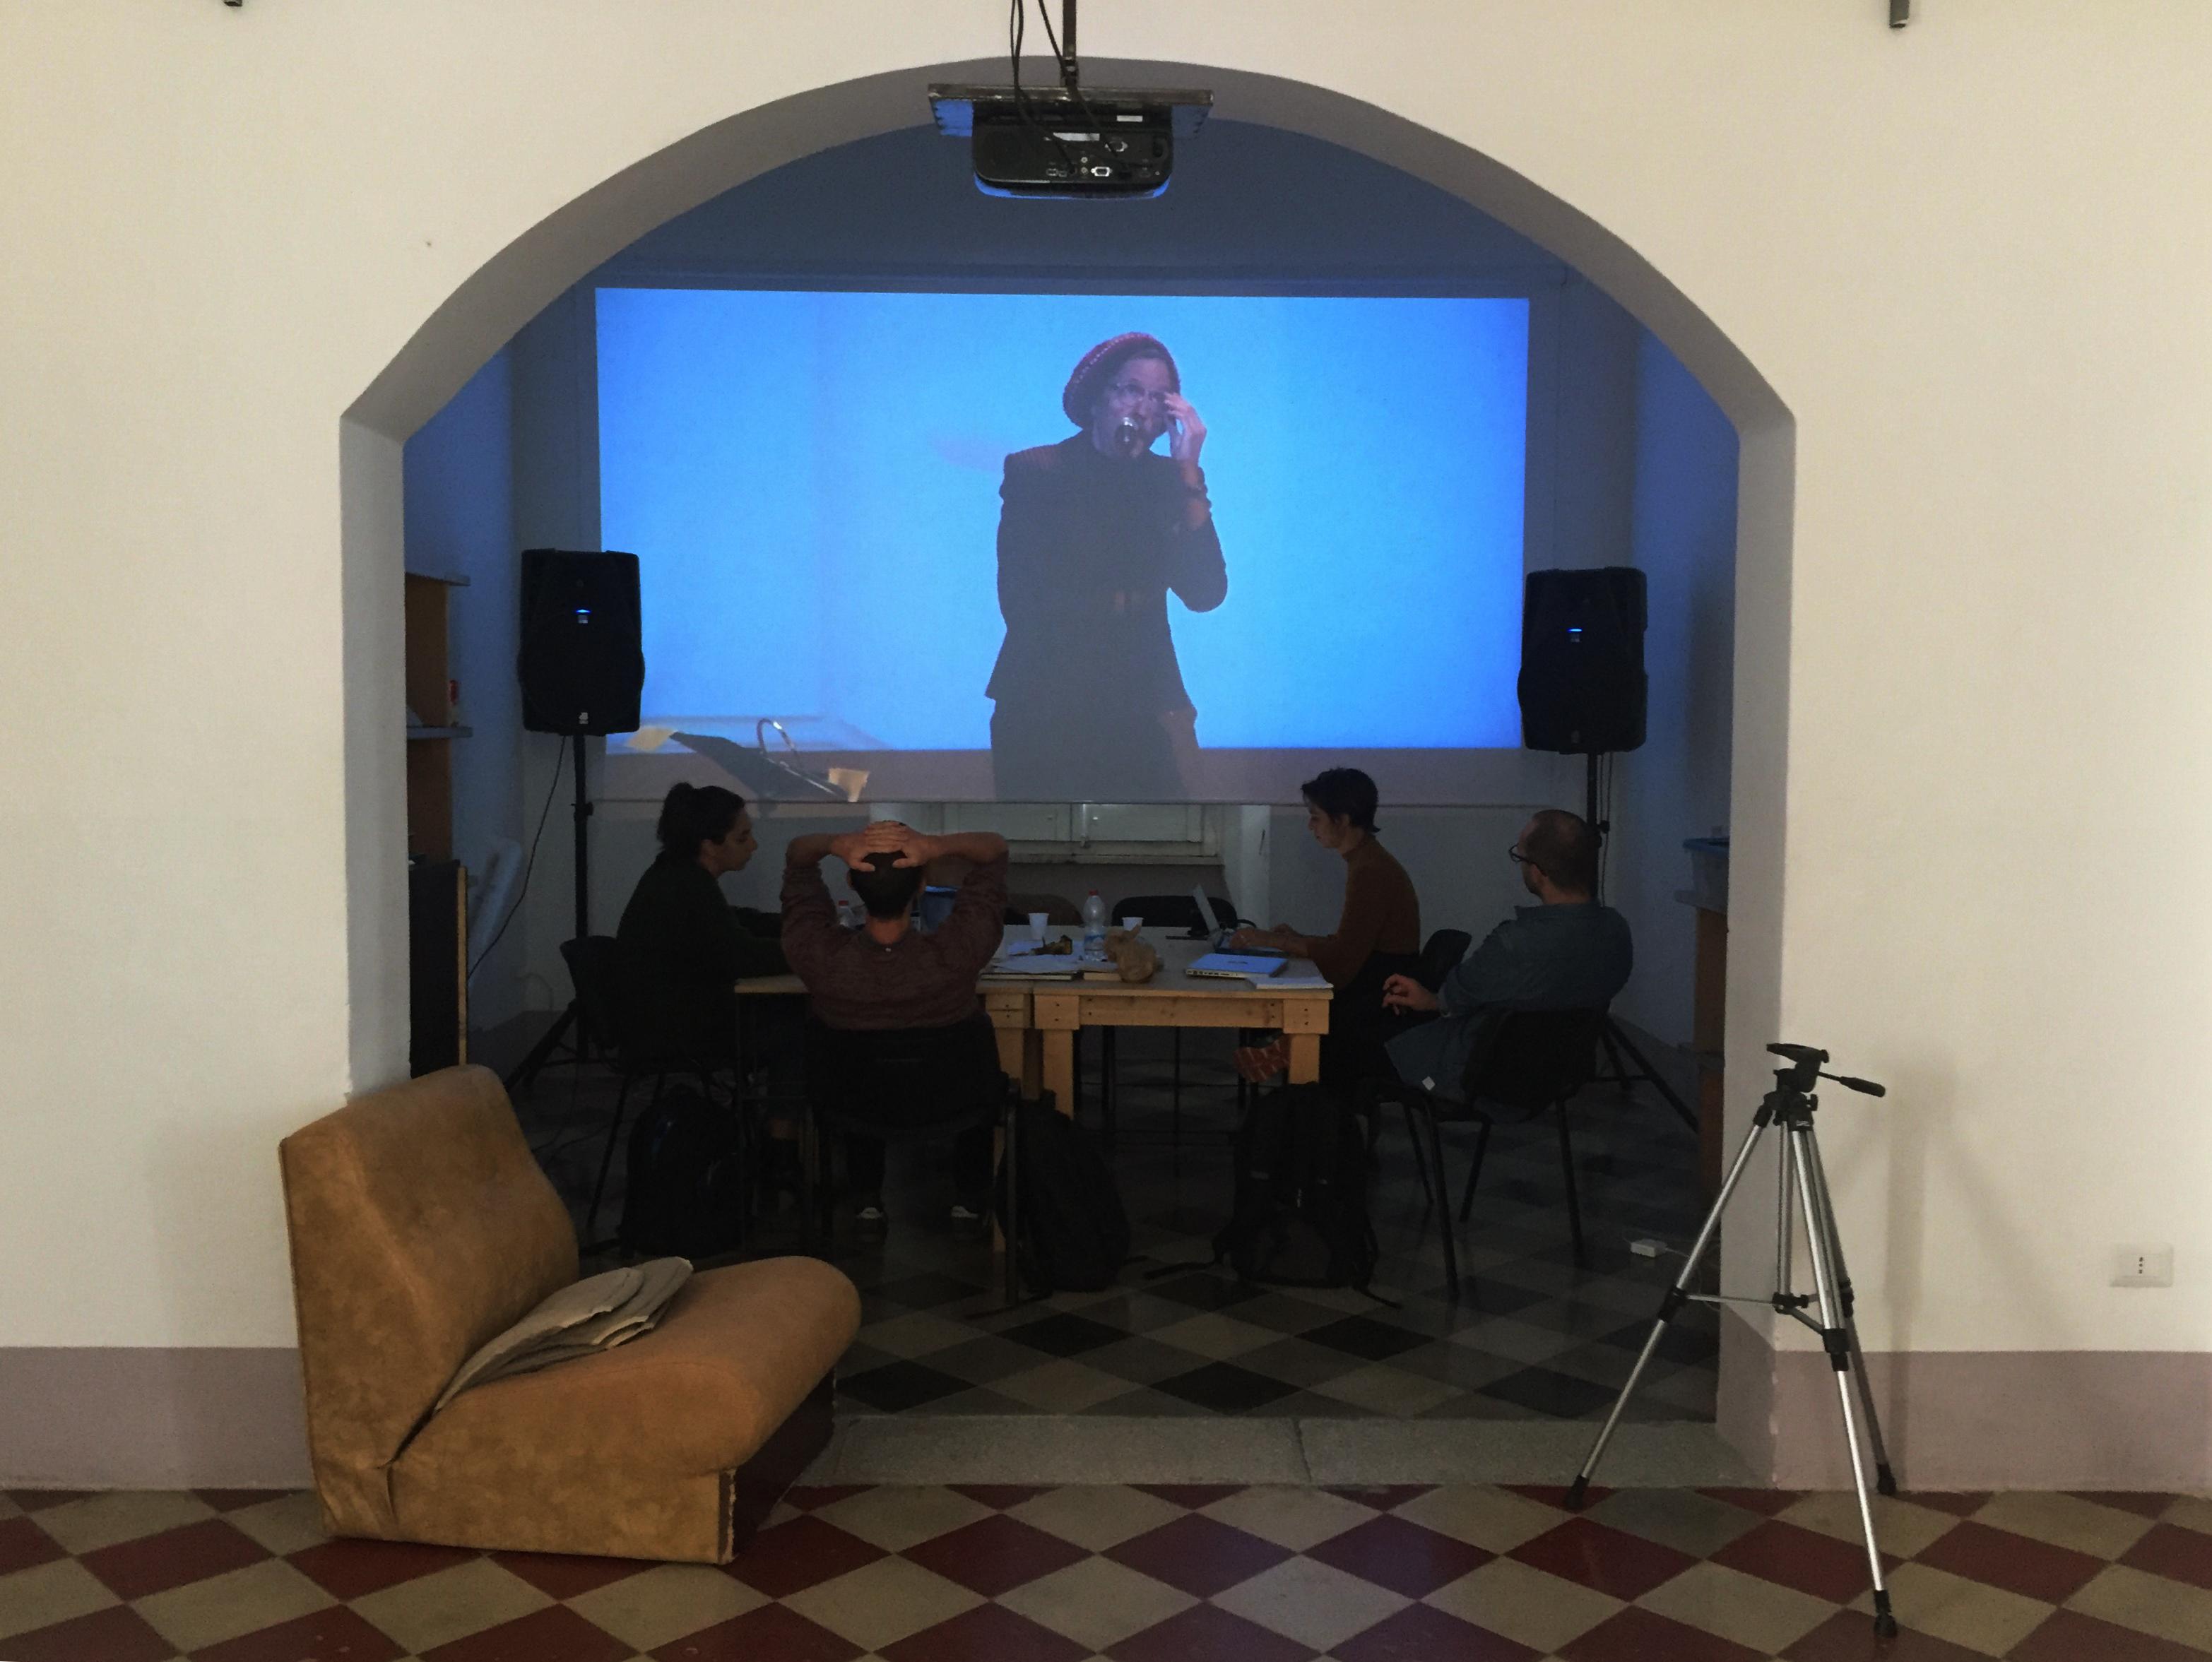 Lastation, Ramdom, Claudio Zecchi, Simona Di Meo, Jacopo Rinaldi, Roberto Memoli, Nuvola Ravera, Alberto Gemmi